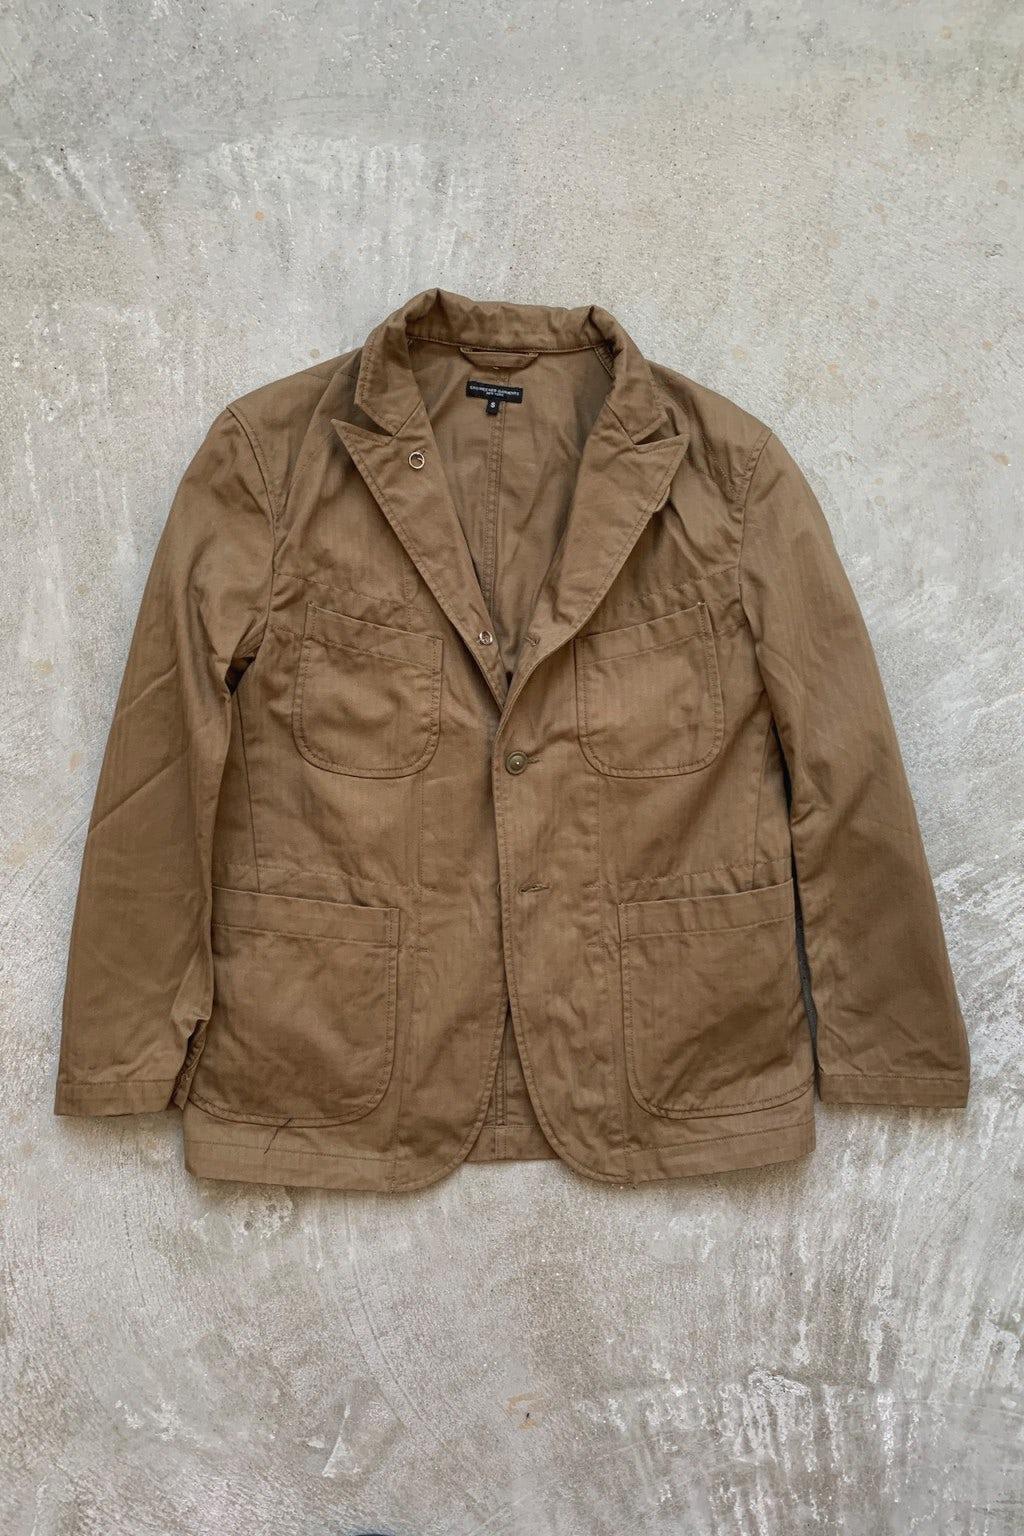 Engineered Garments Bedford Jacket  Brown Cotton Herringbone Twill